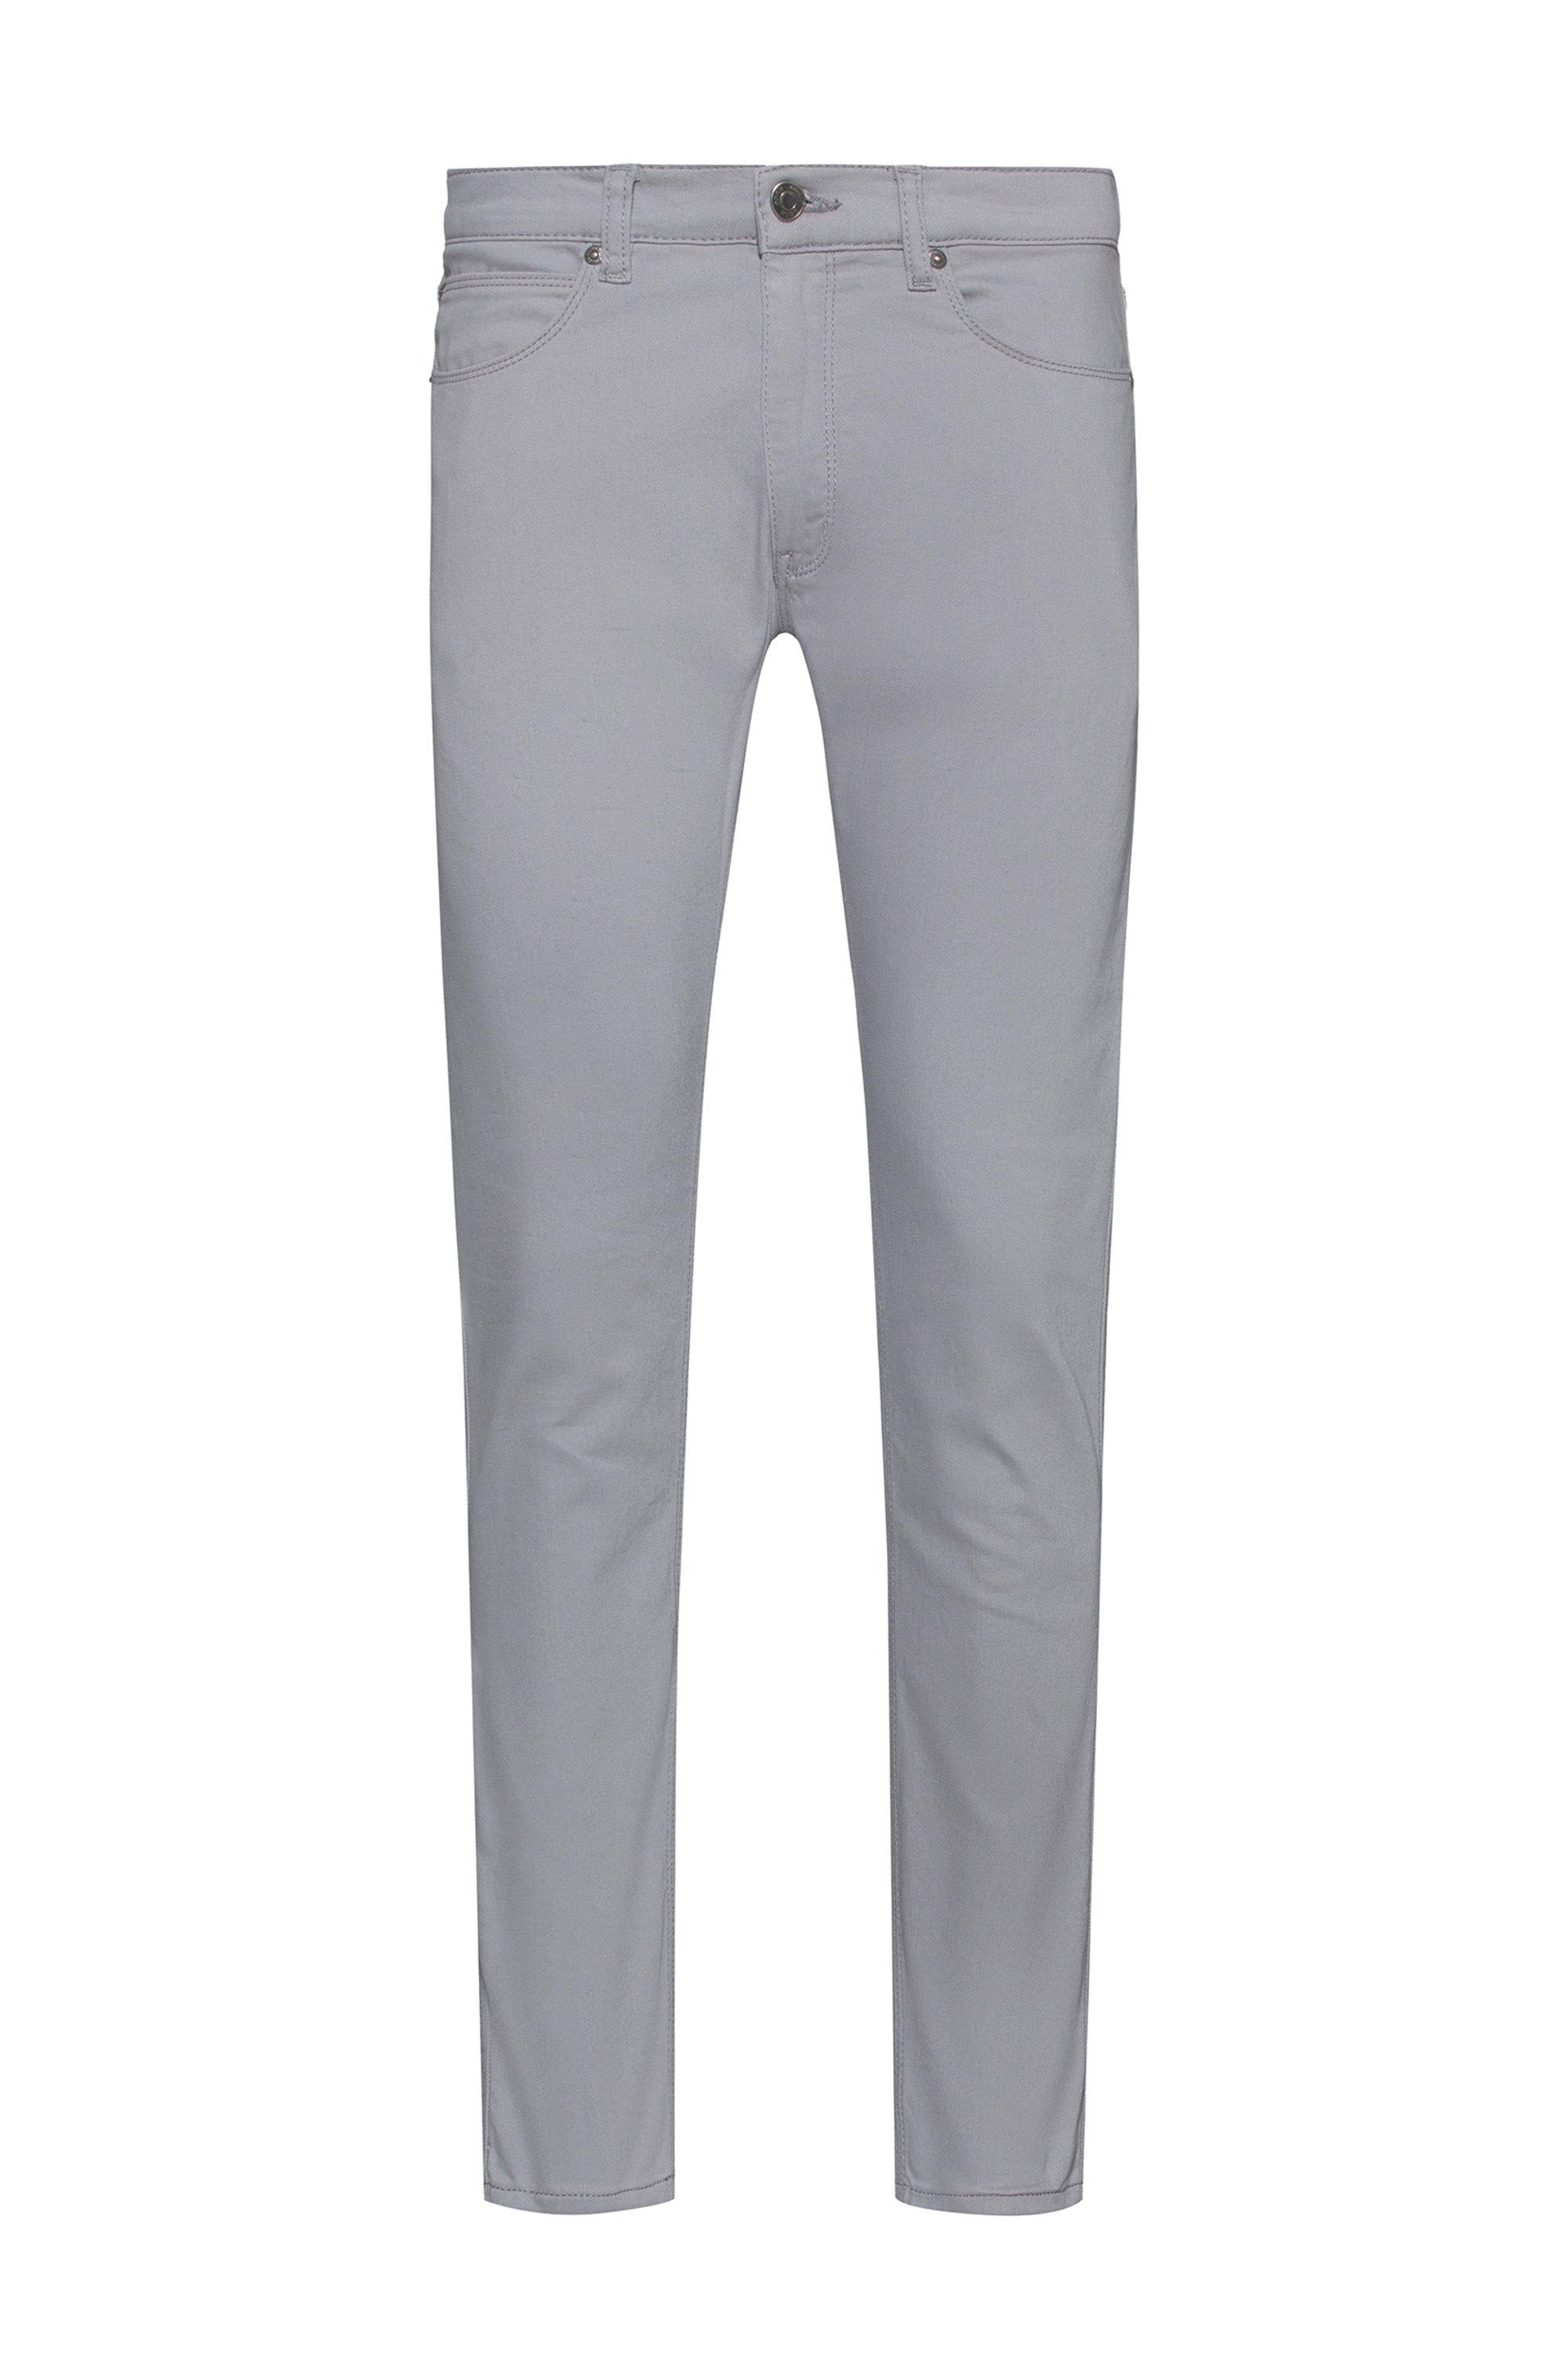 Extra-slim-fit jeans in dark-gray stretch denim, Silver